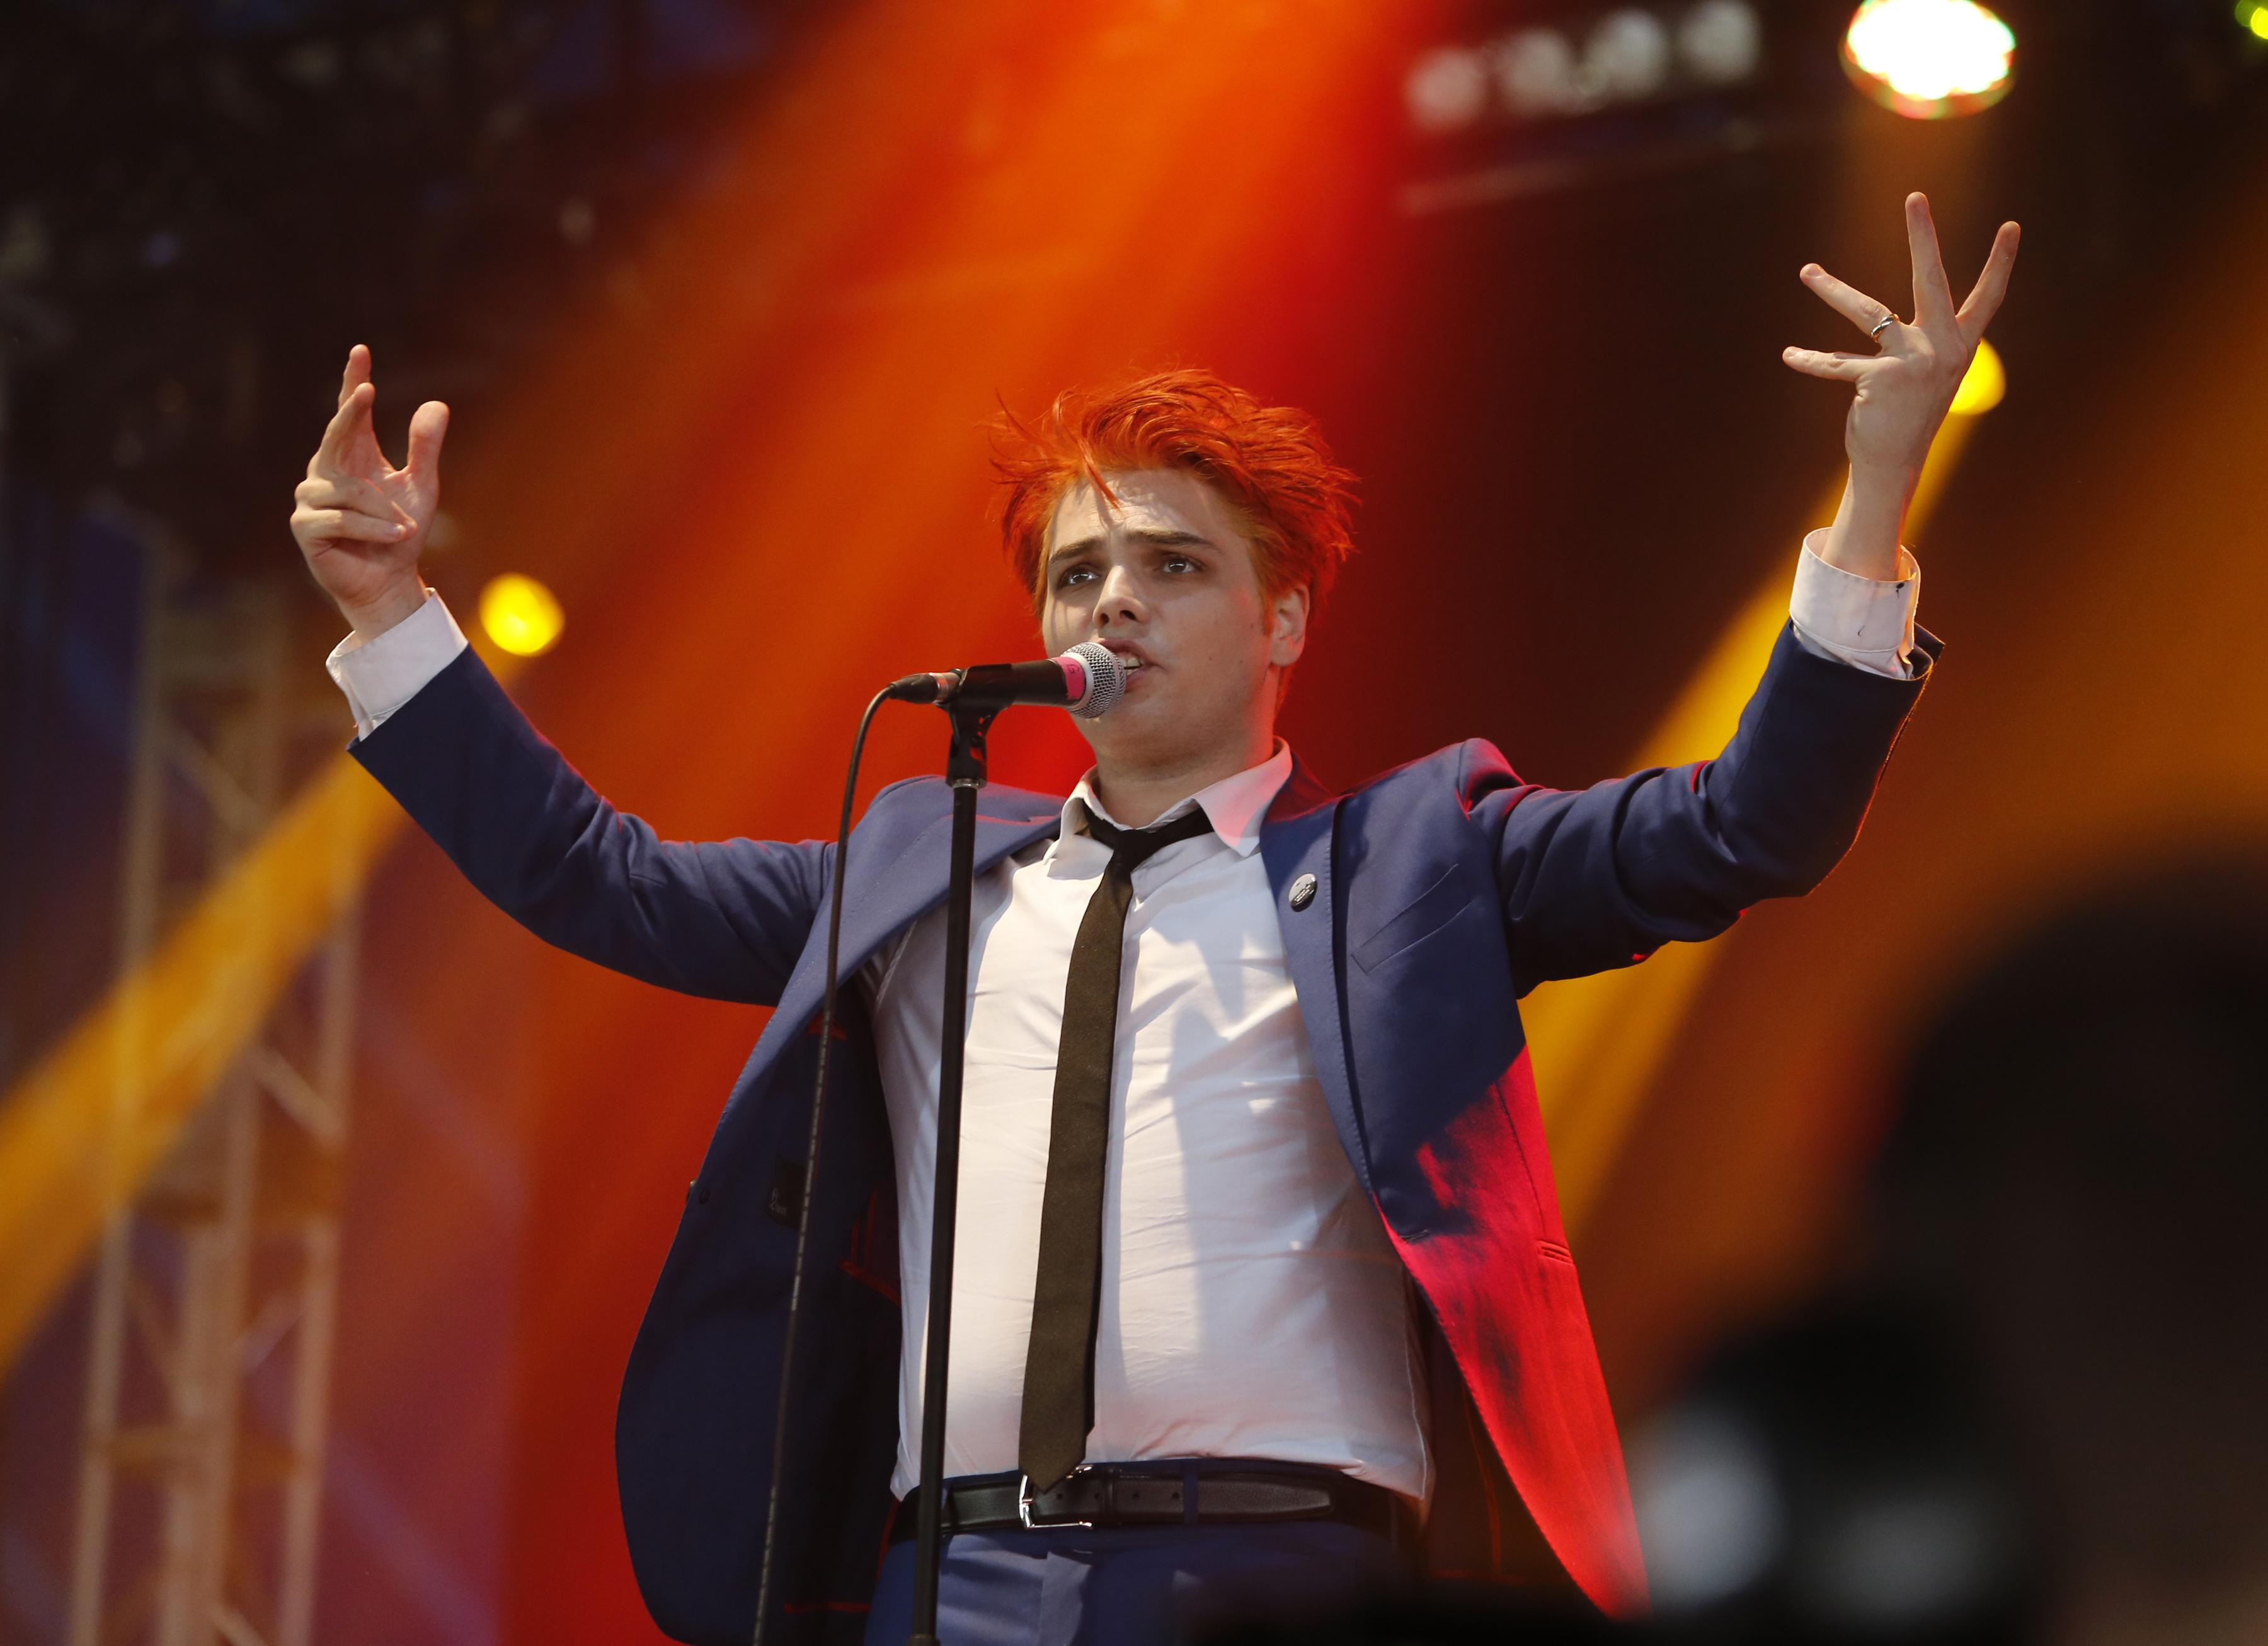 Gerard Way Makes Britpop Solo Debut at U.K.'s Reading Festival